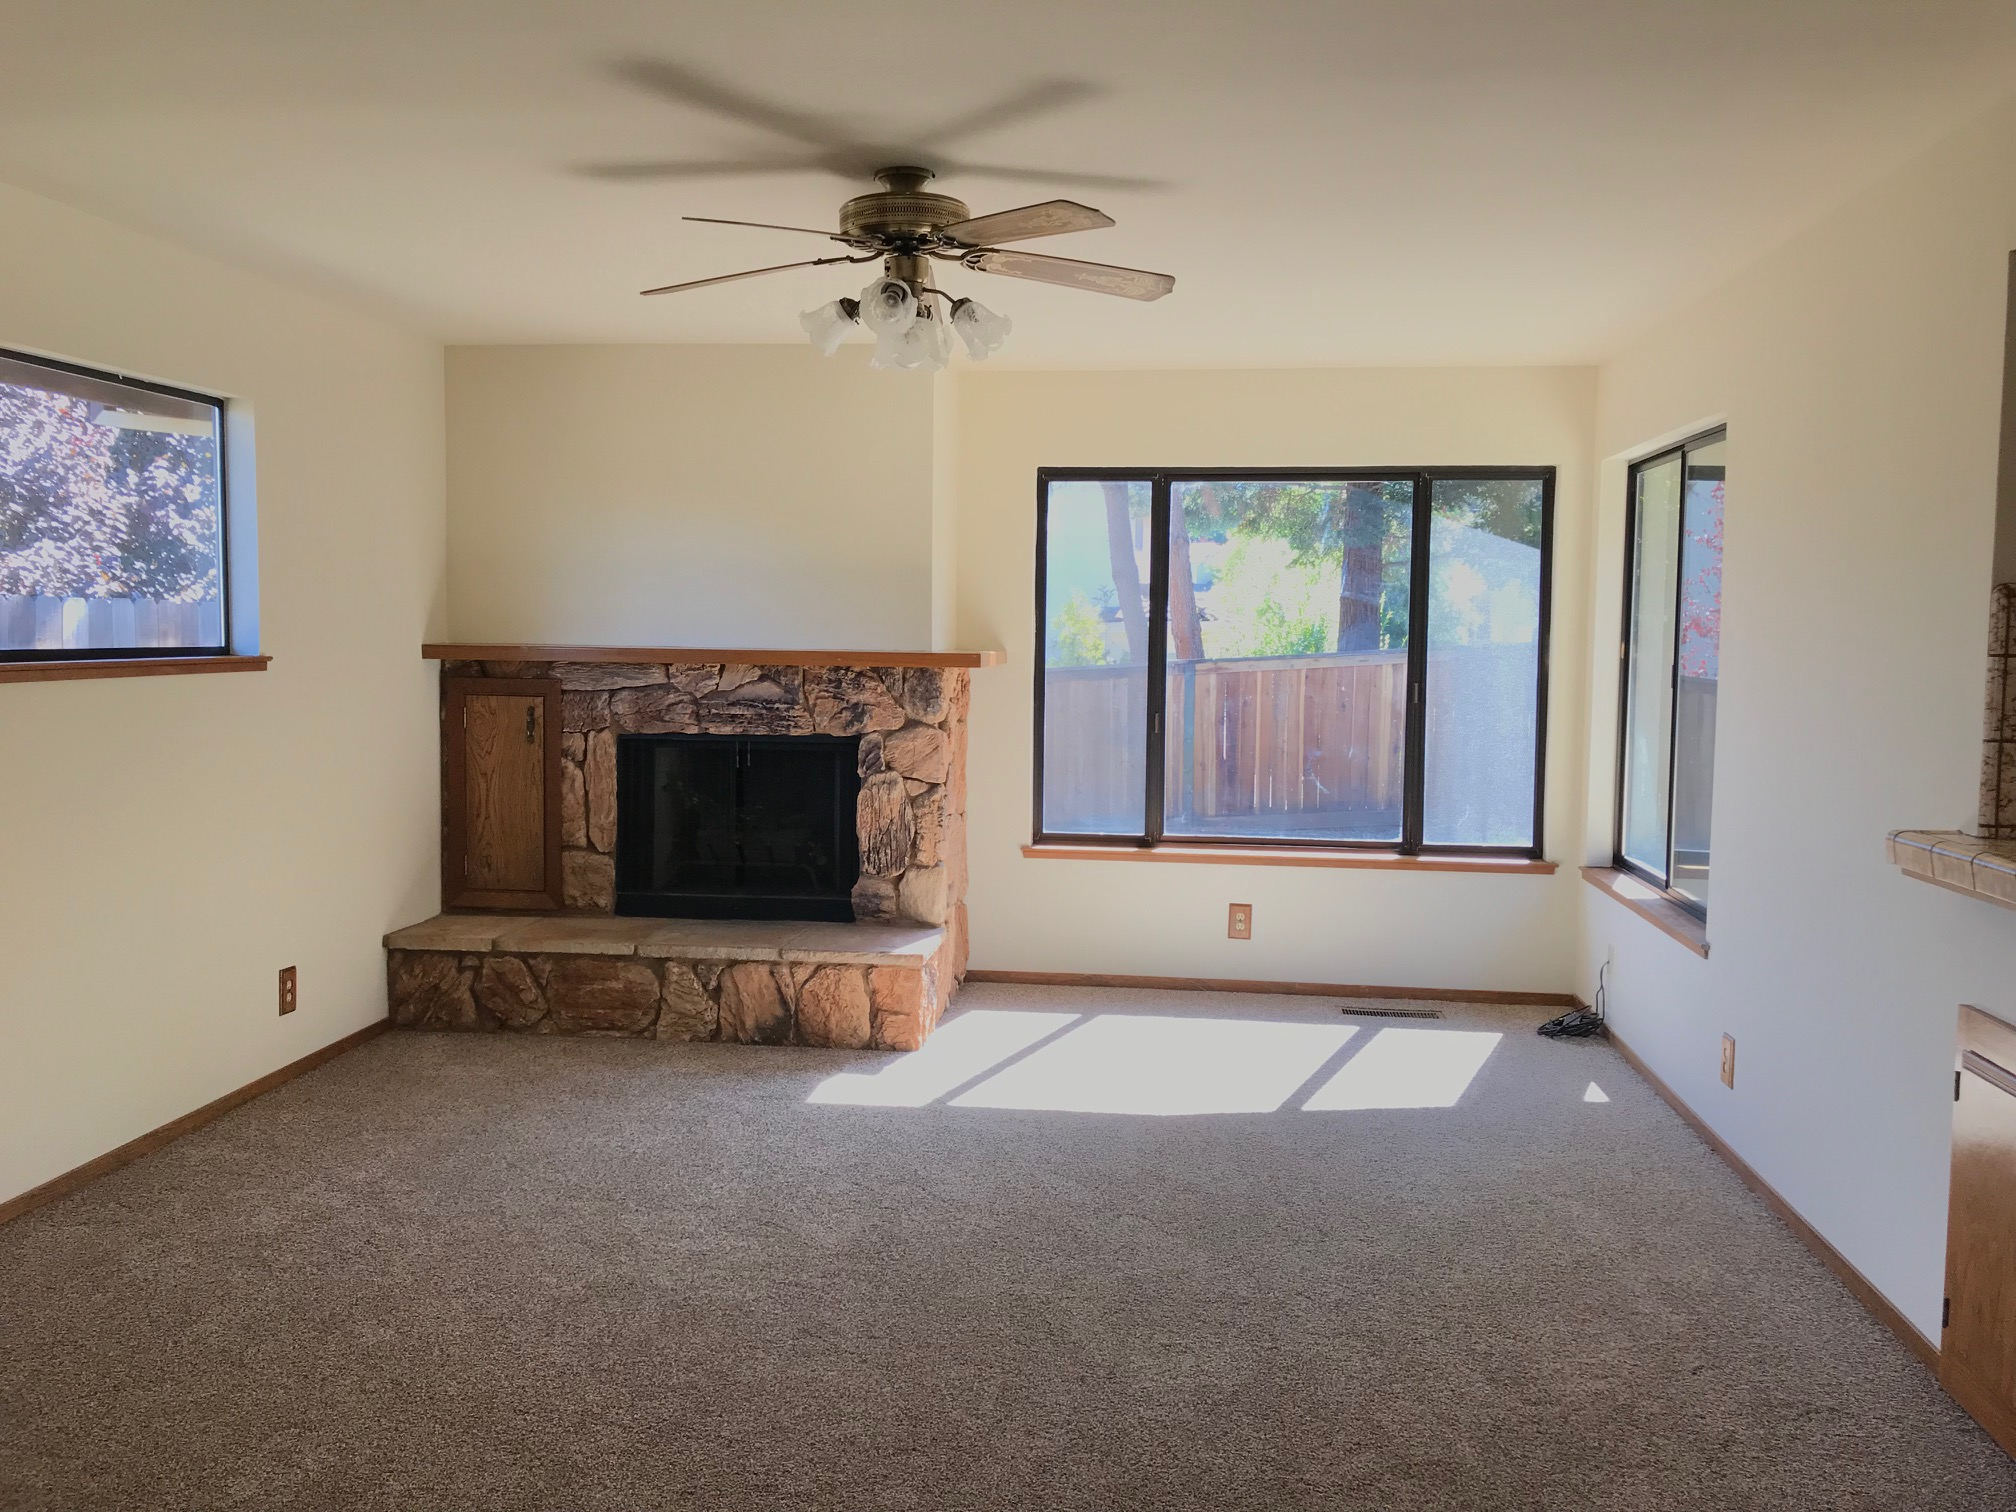 3509 Twin Oaks Court, Napa, CA, 94558 - 6